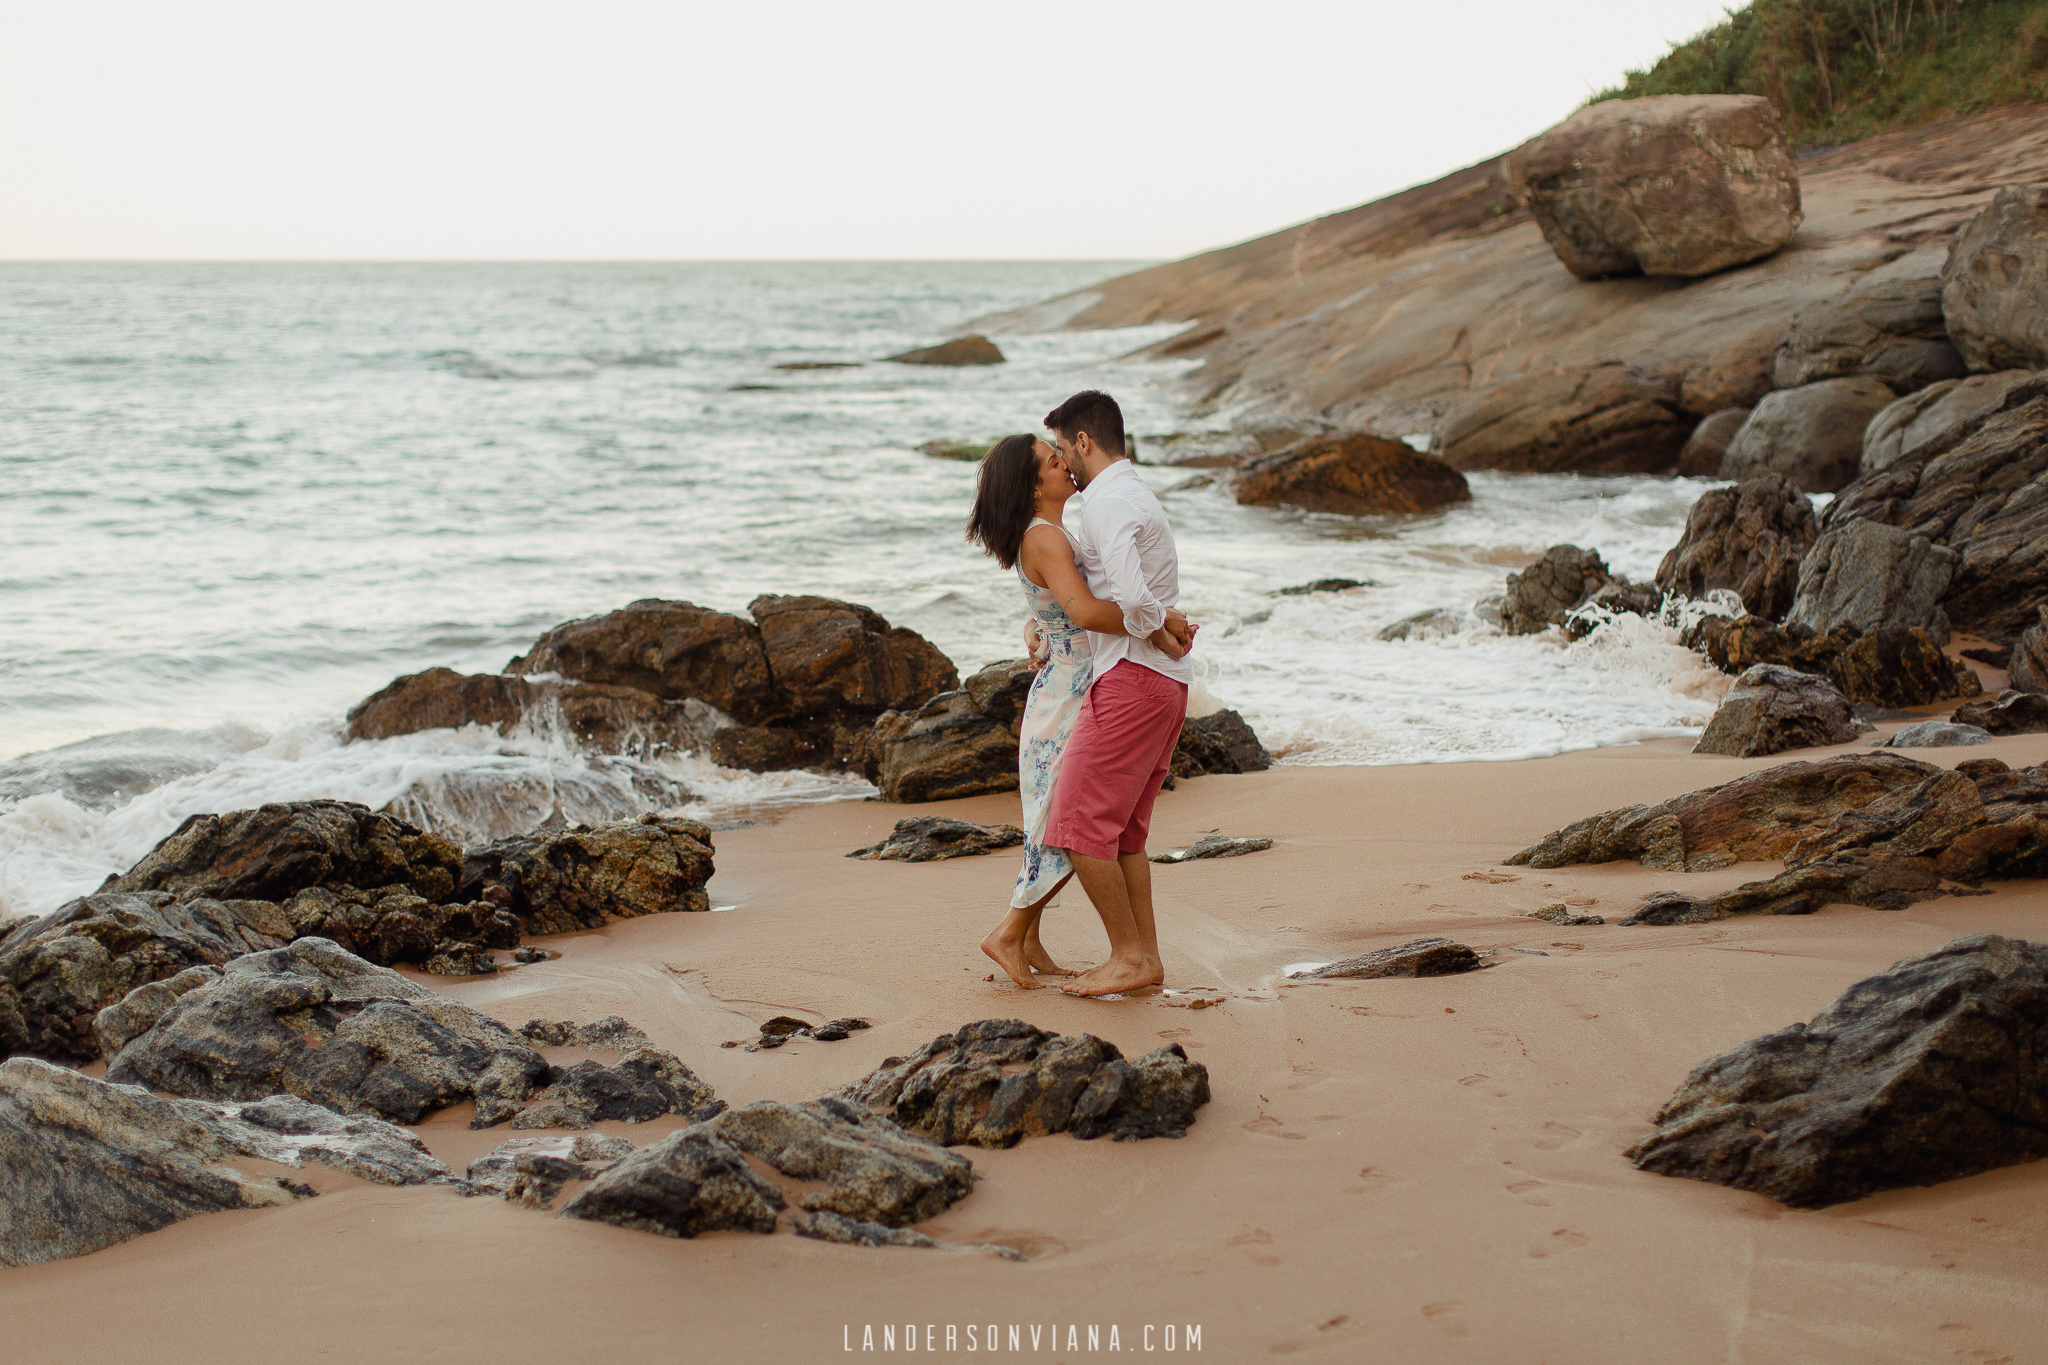 ensaio-pre-wedding-praia-landerson-viana-fotografia-casamento-pegueiobouquet-17.jpg